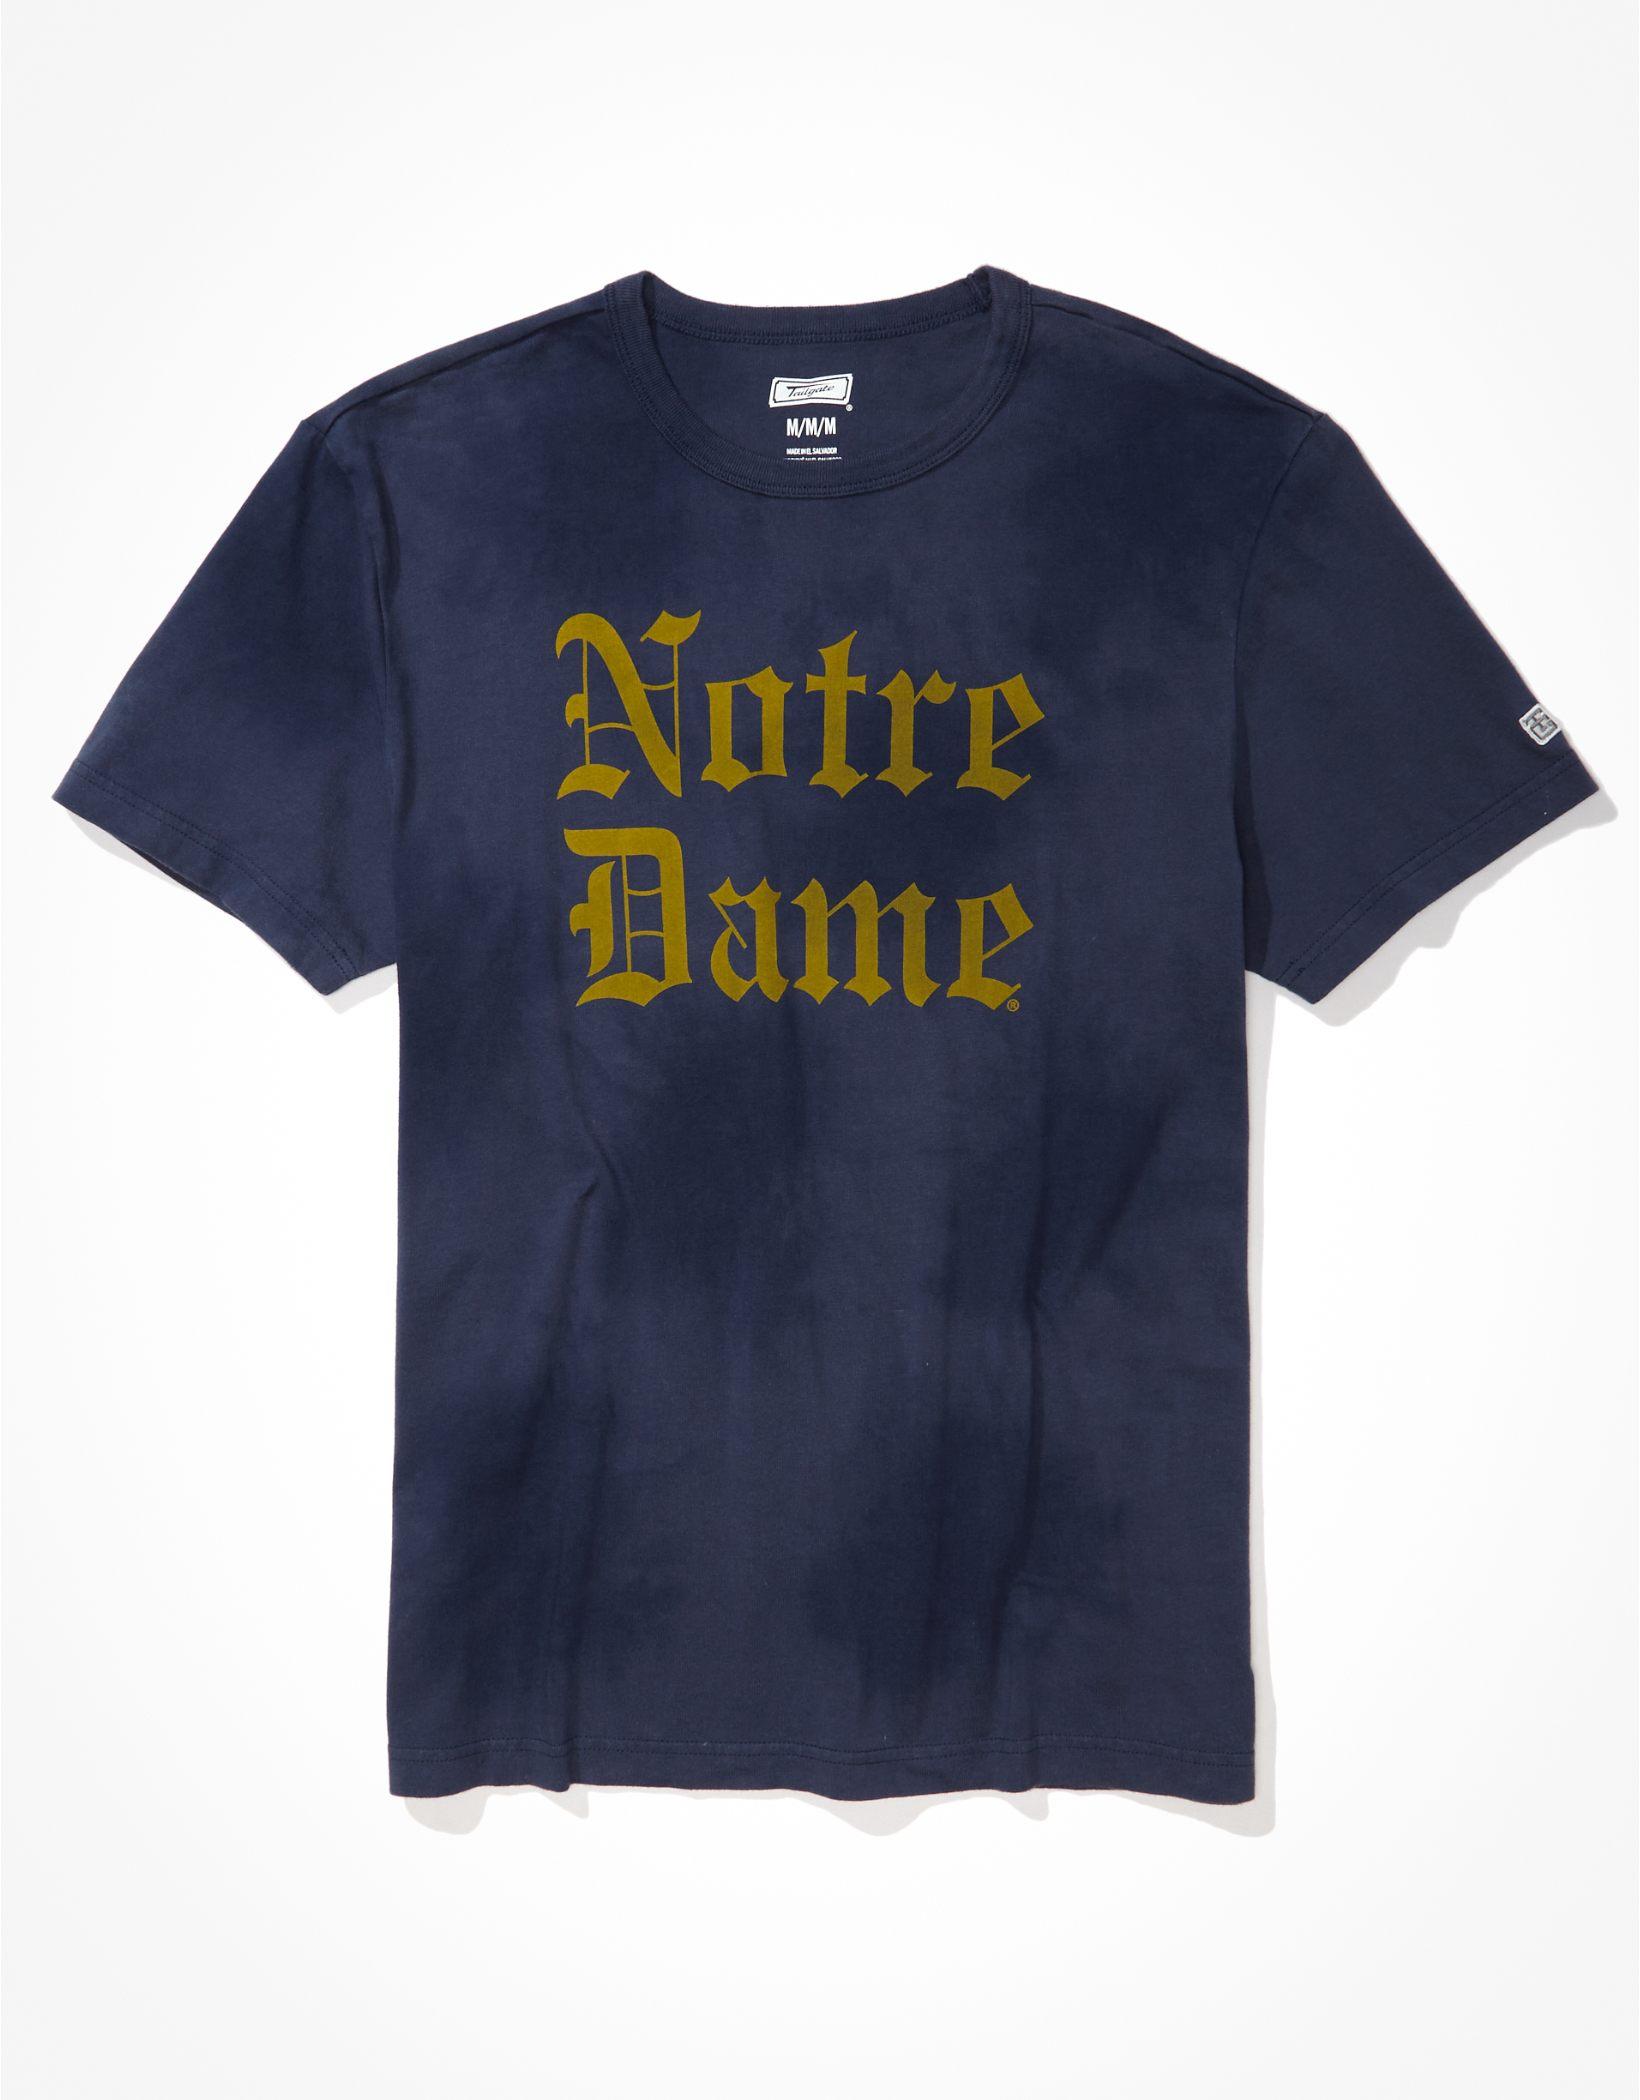 Tailgate Men's Notre Dame Tonal Tie-Dye T-Shirt